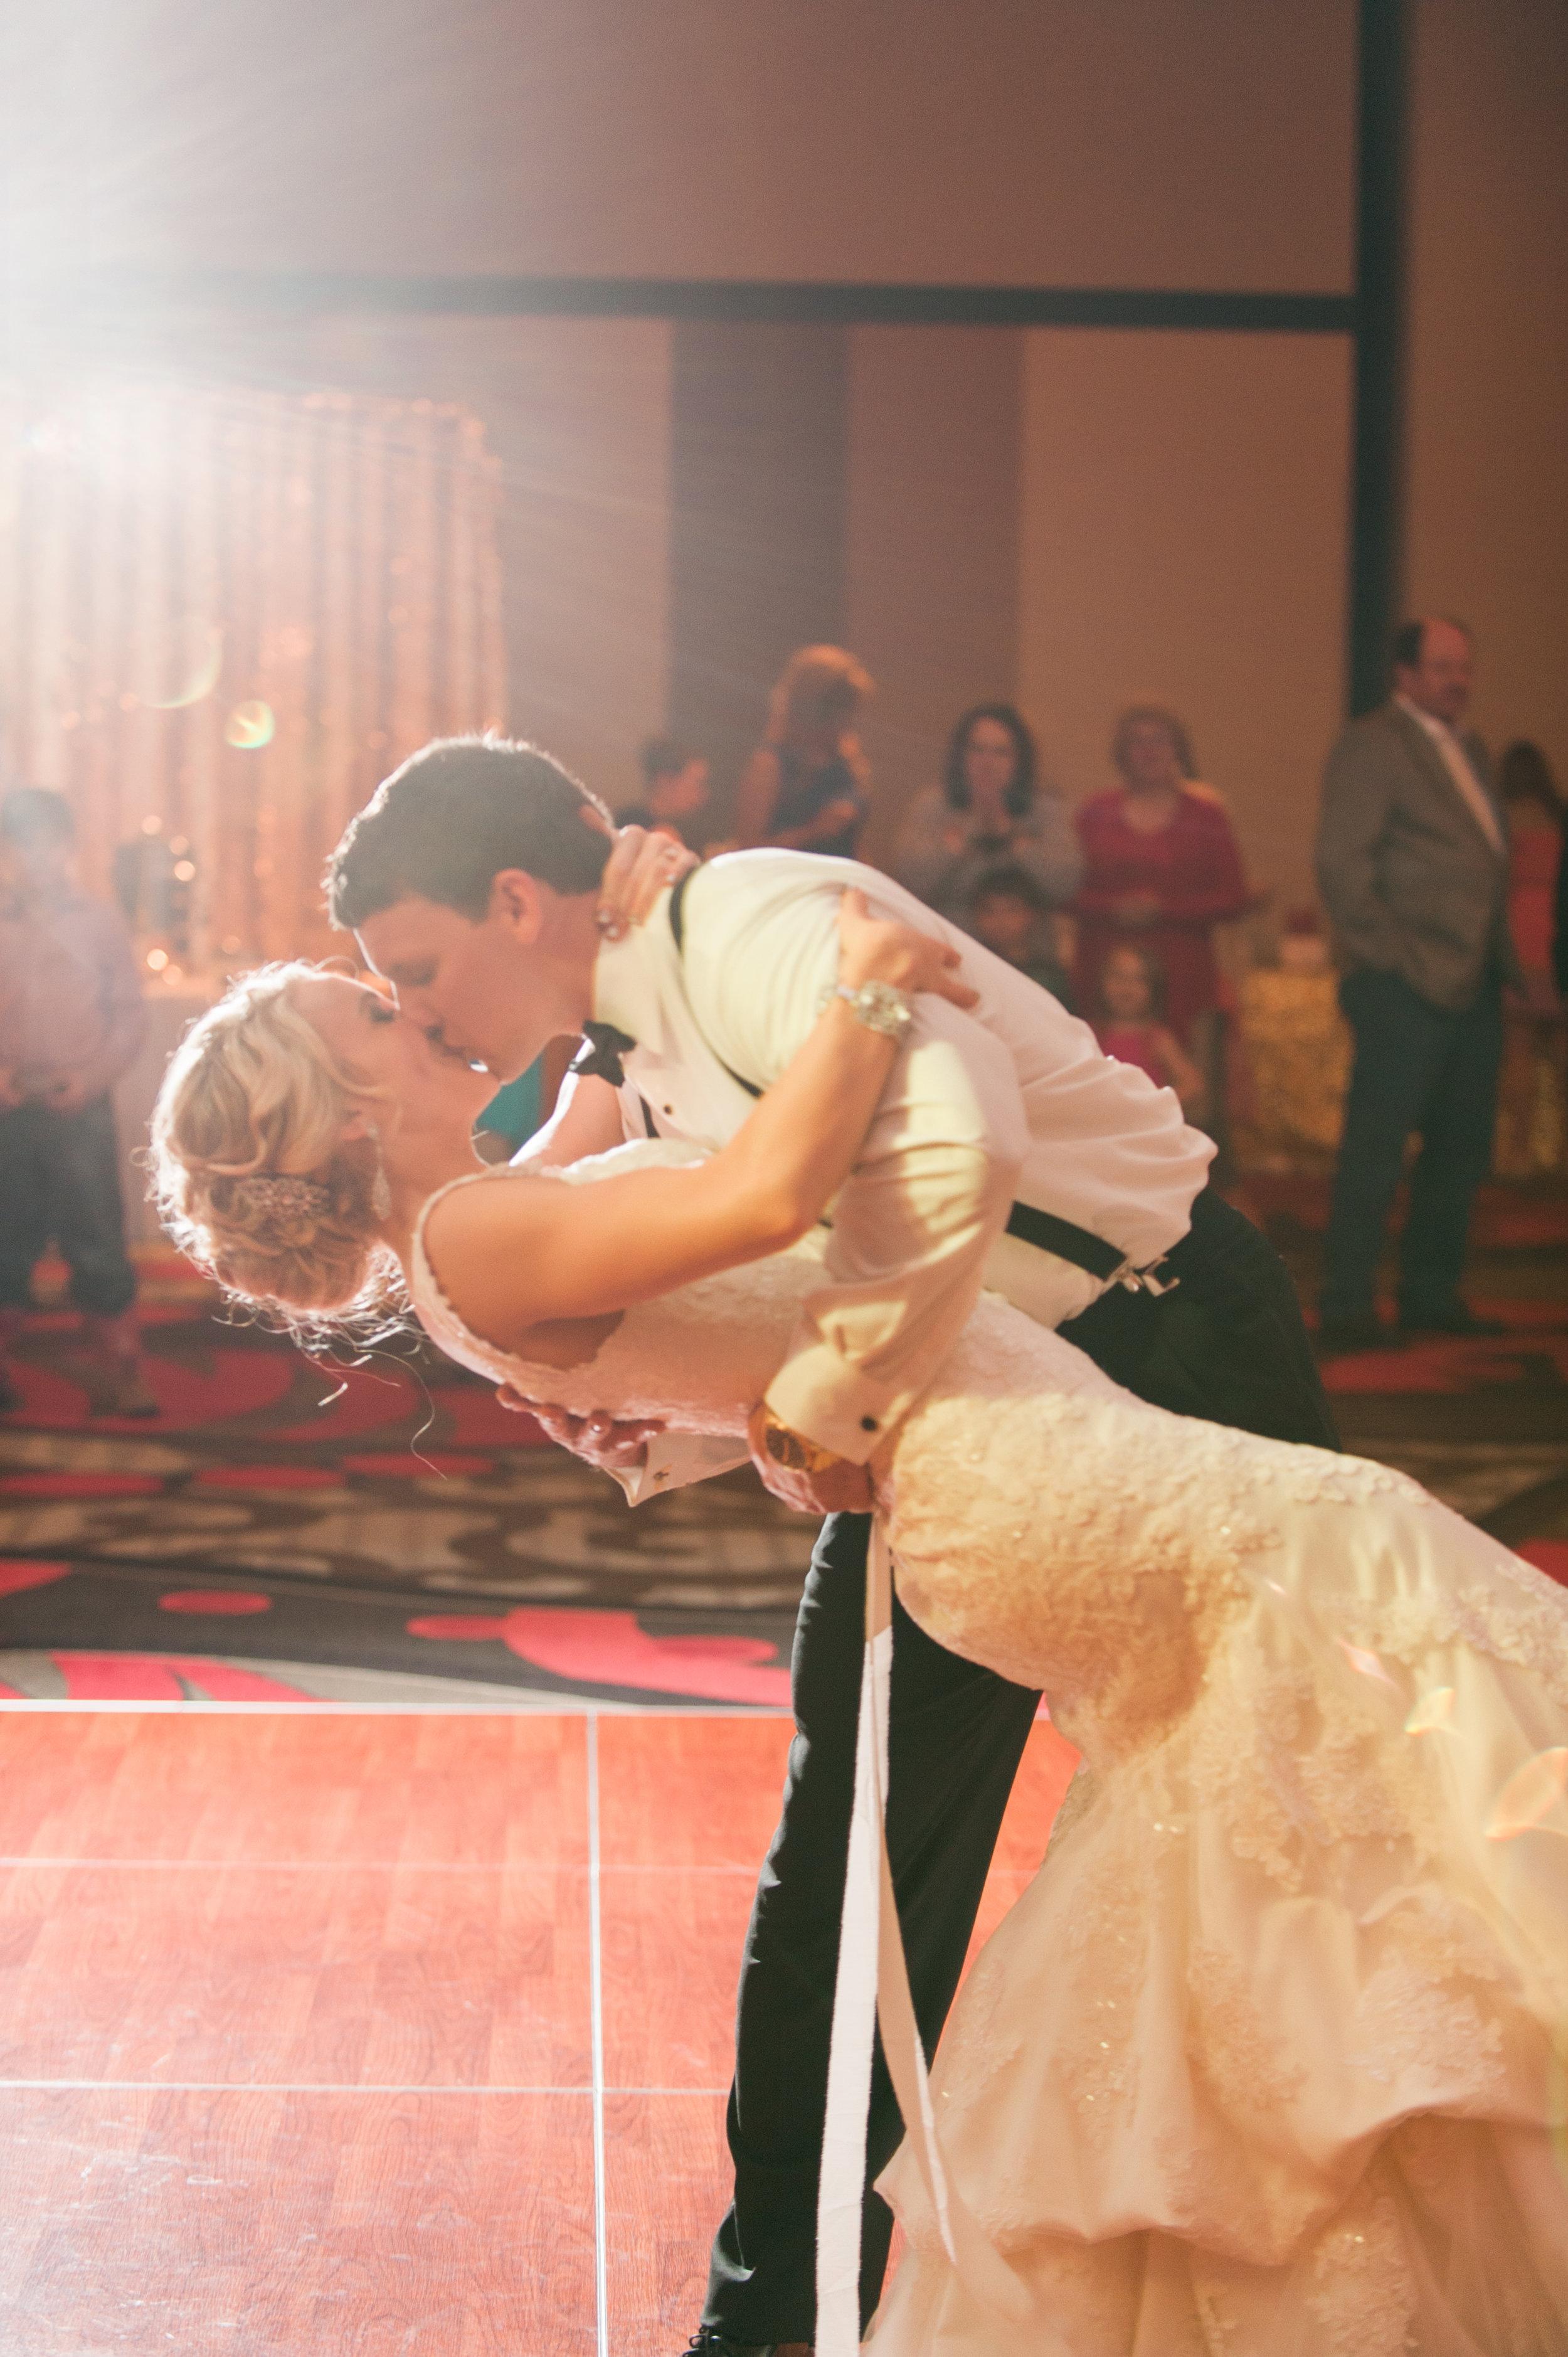 Younes Conference Center Kearney Ne wedding photography